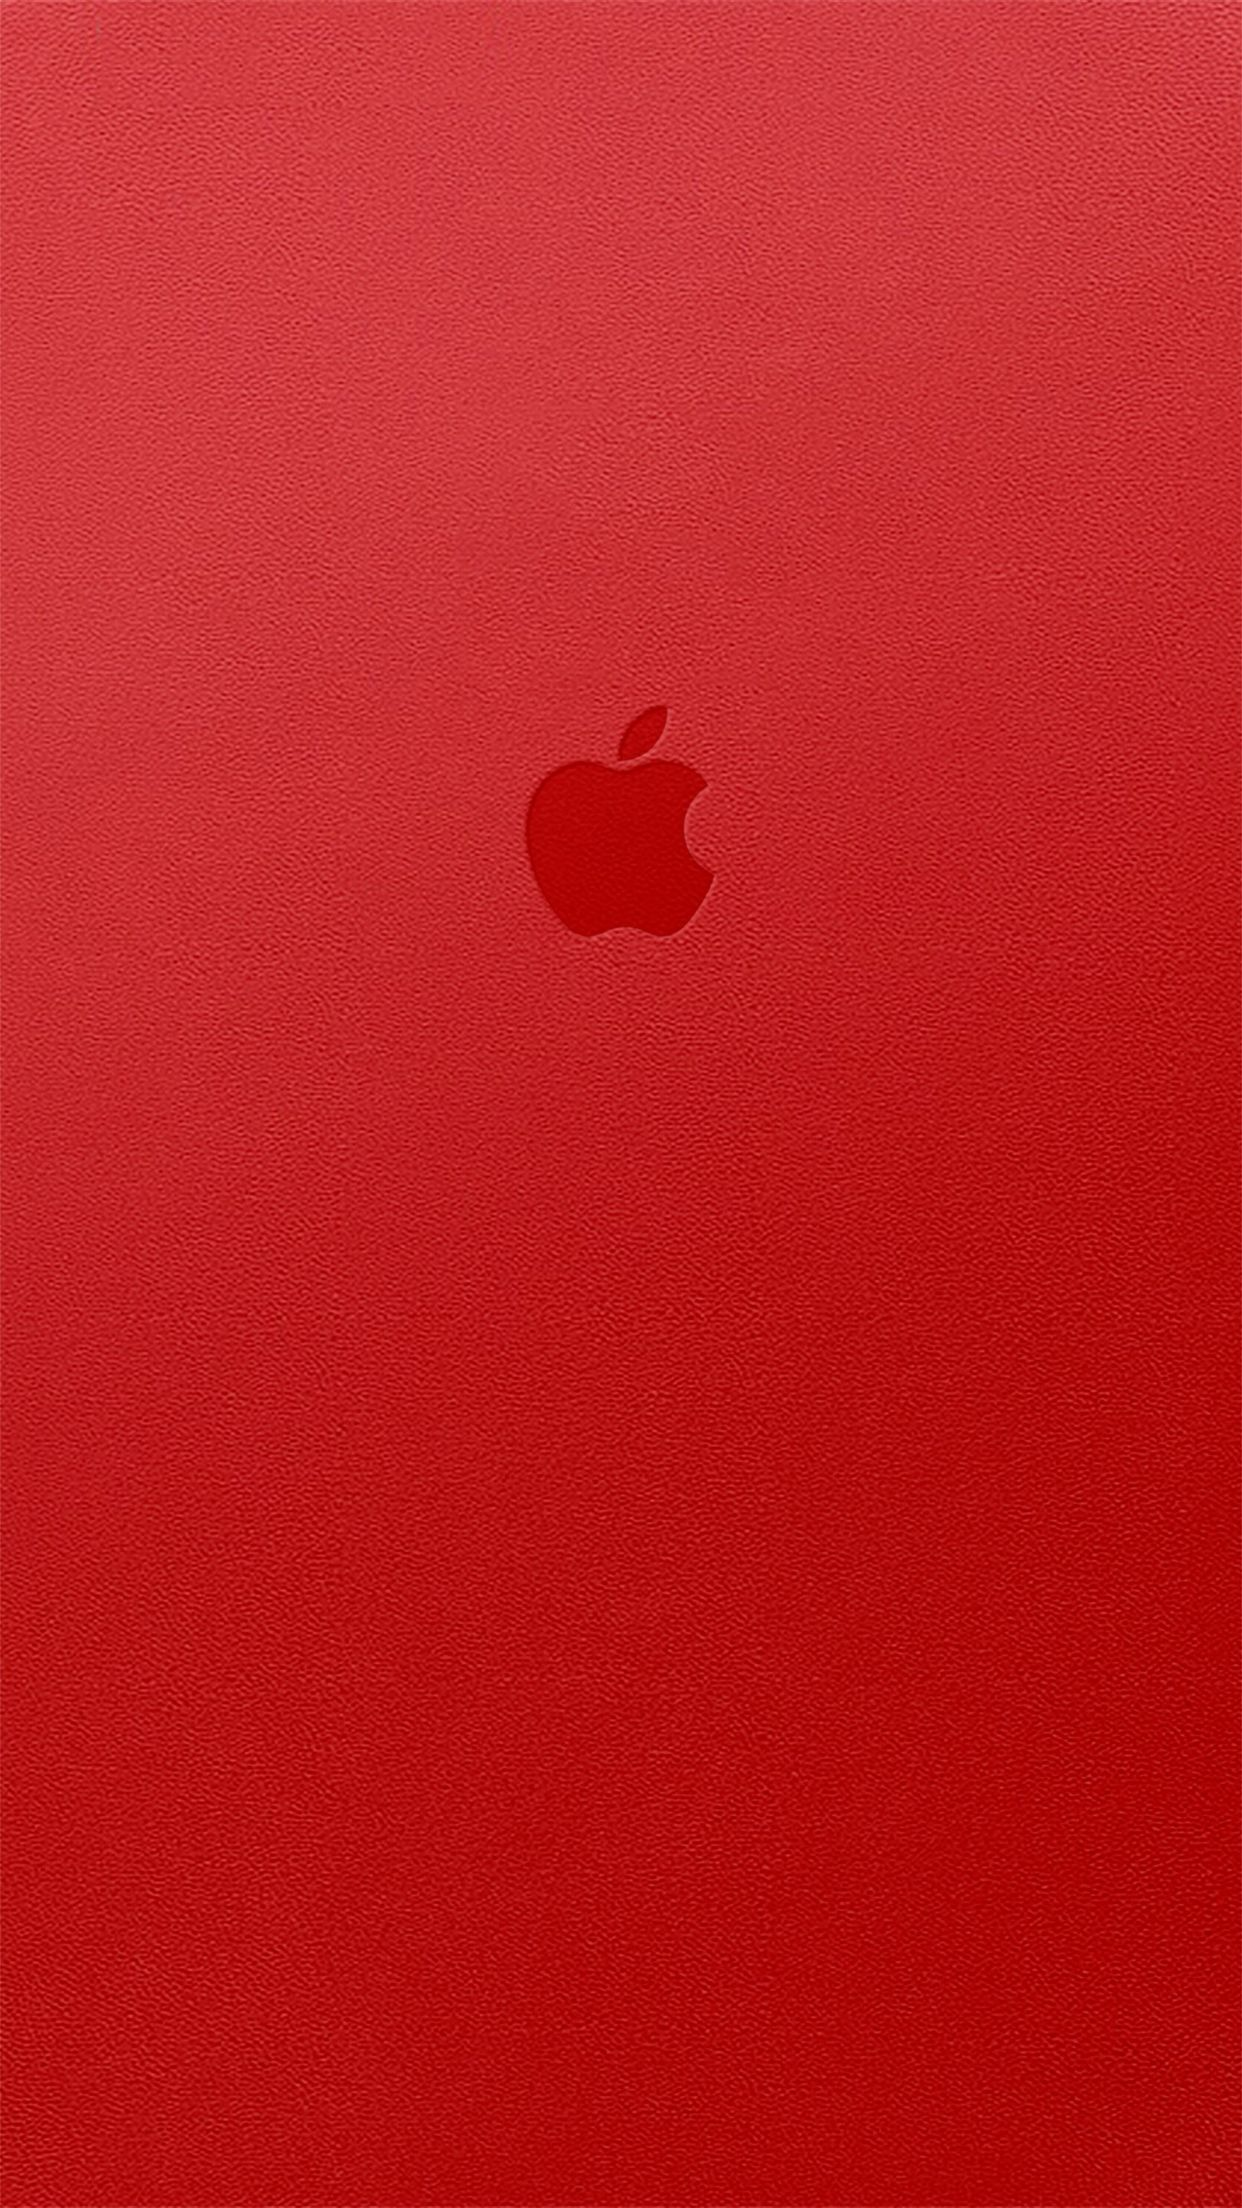 Apple Iphone 6s Plus Wallpaper Red Apple Logo Wallpaper